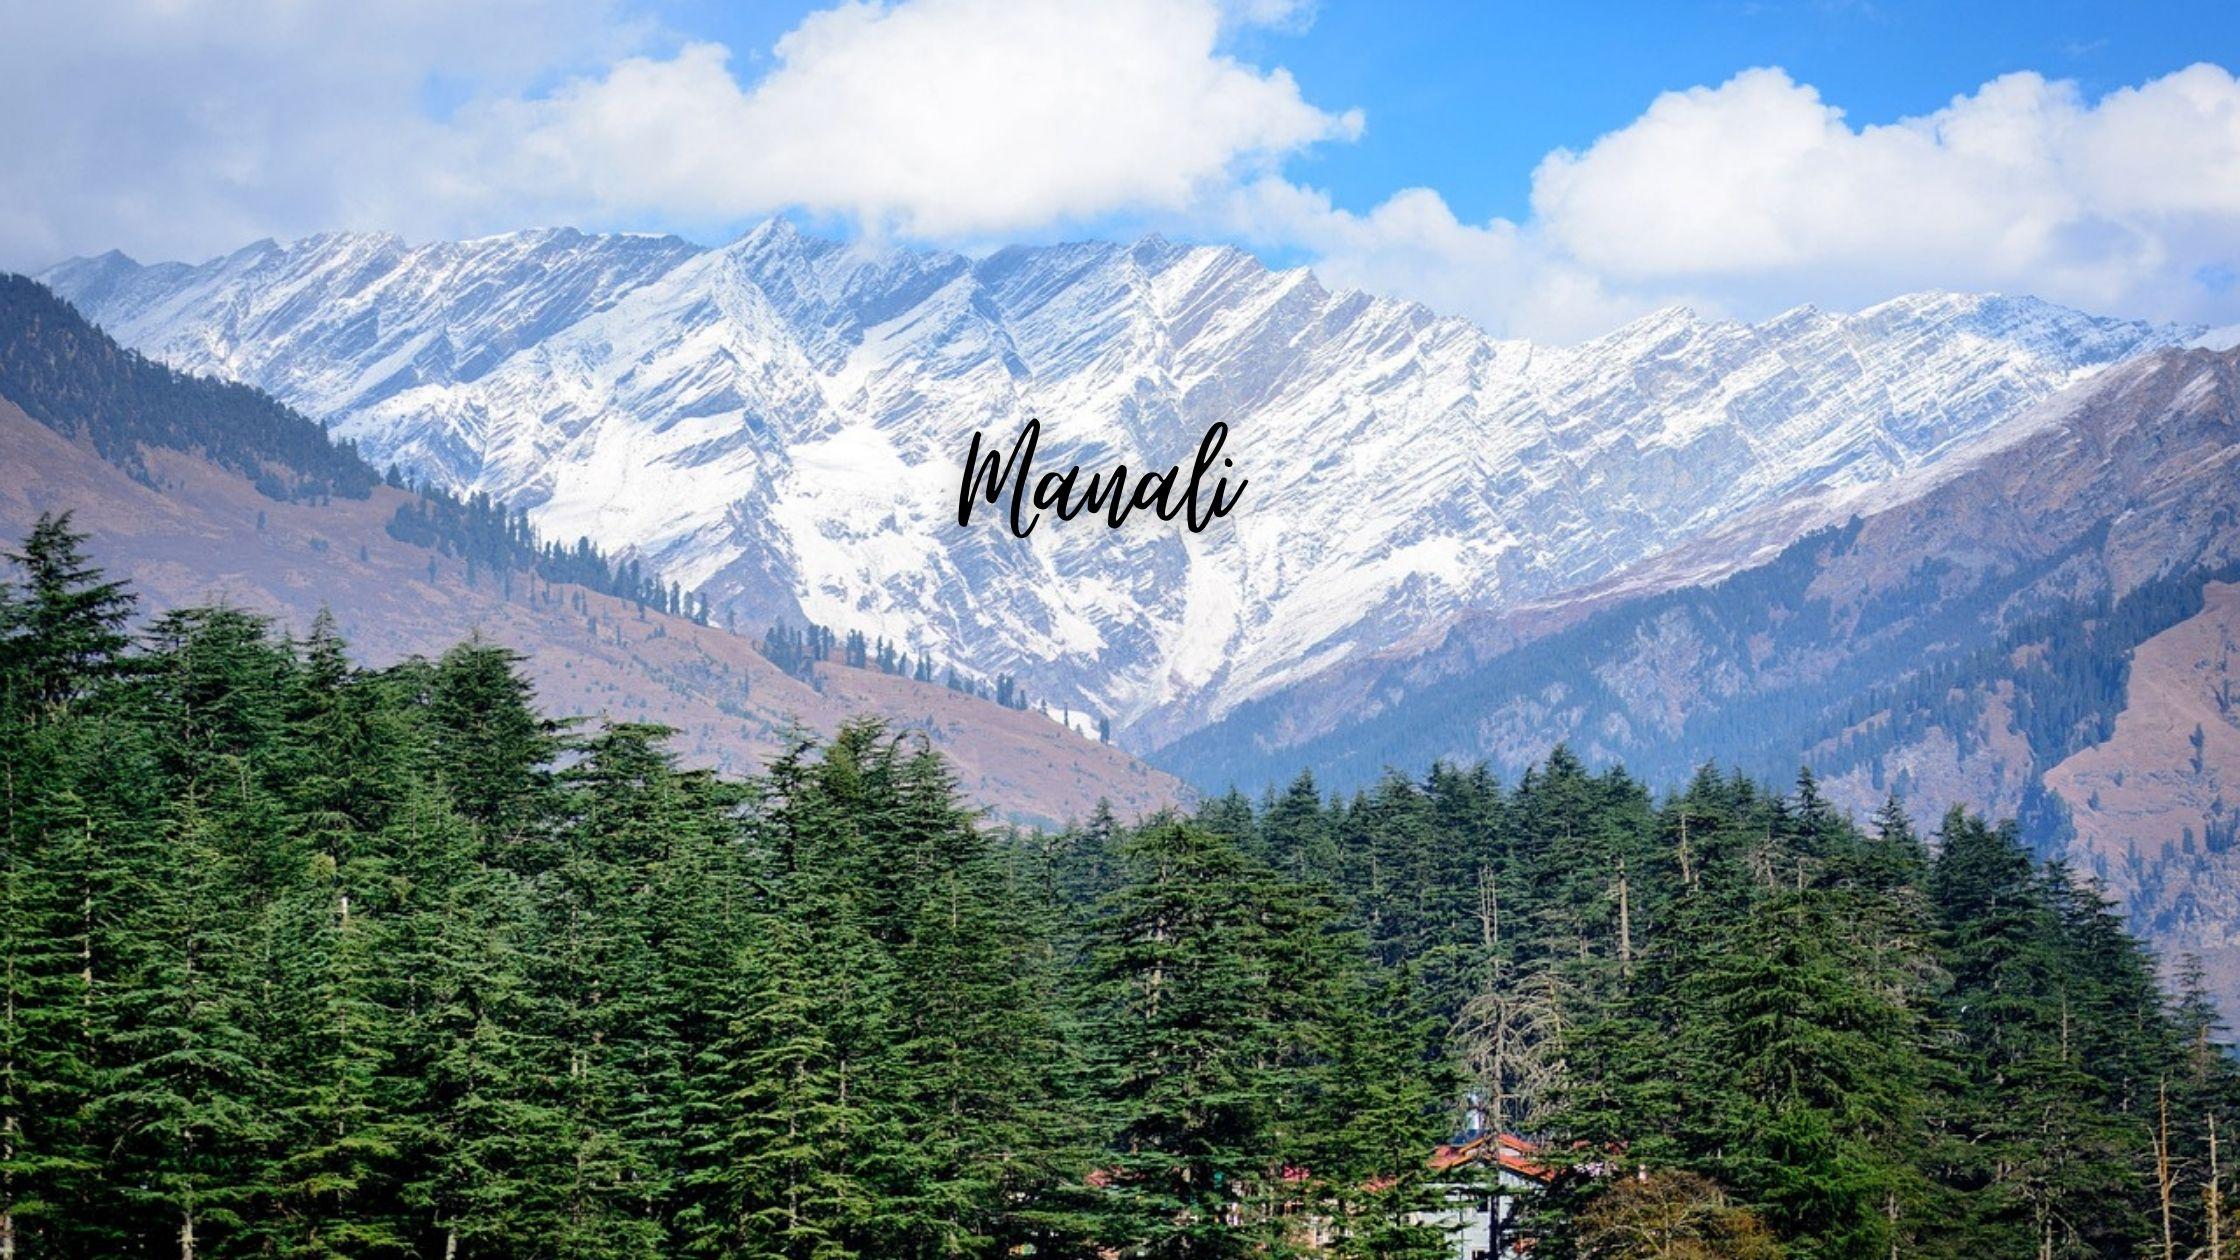 Manali - Snowy Honeymoon Destinations in India